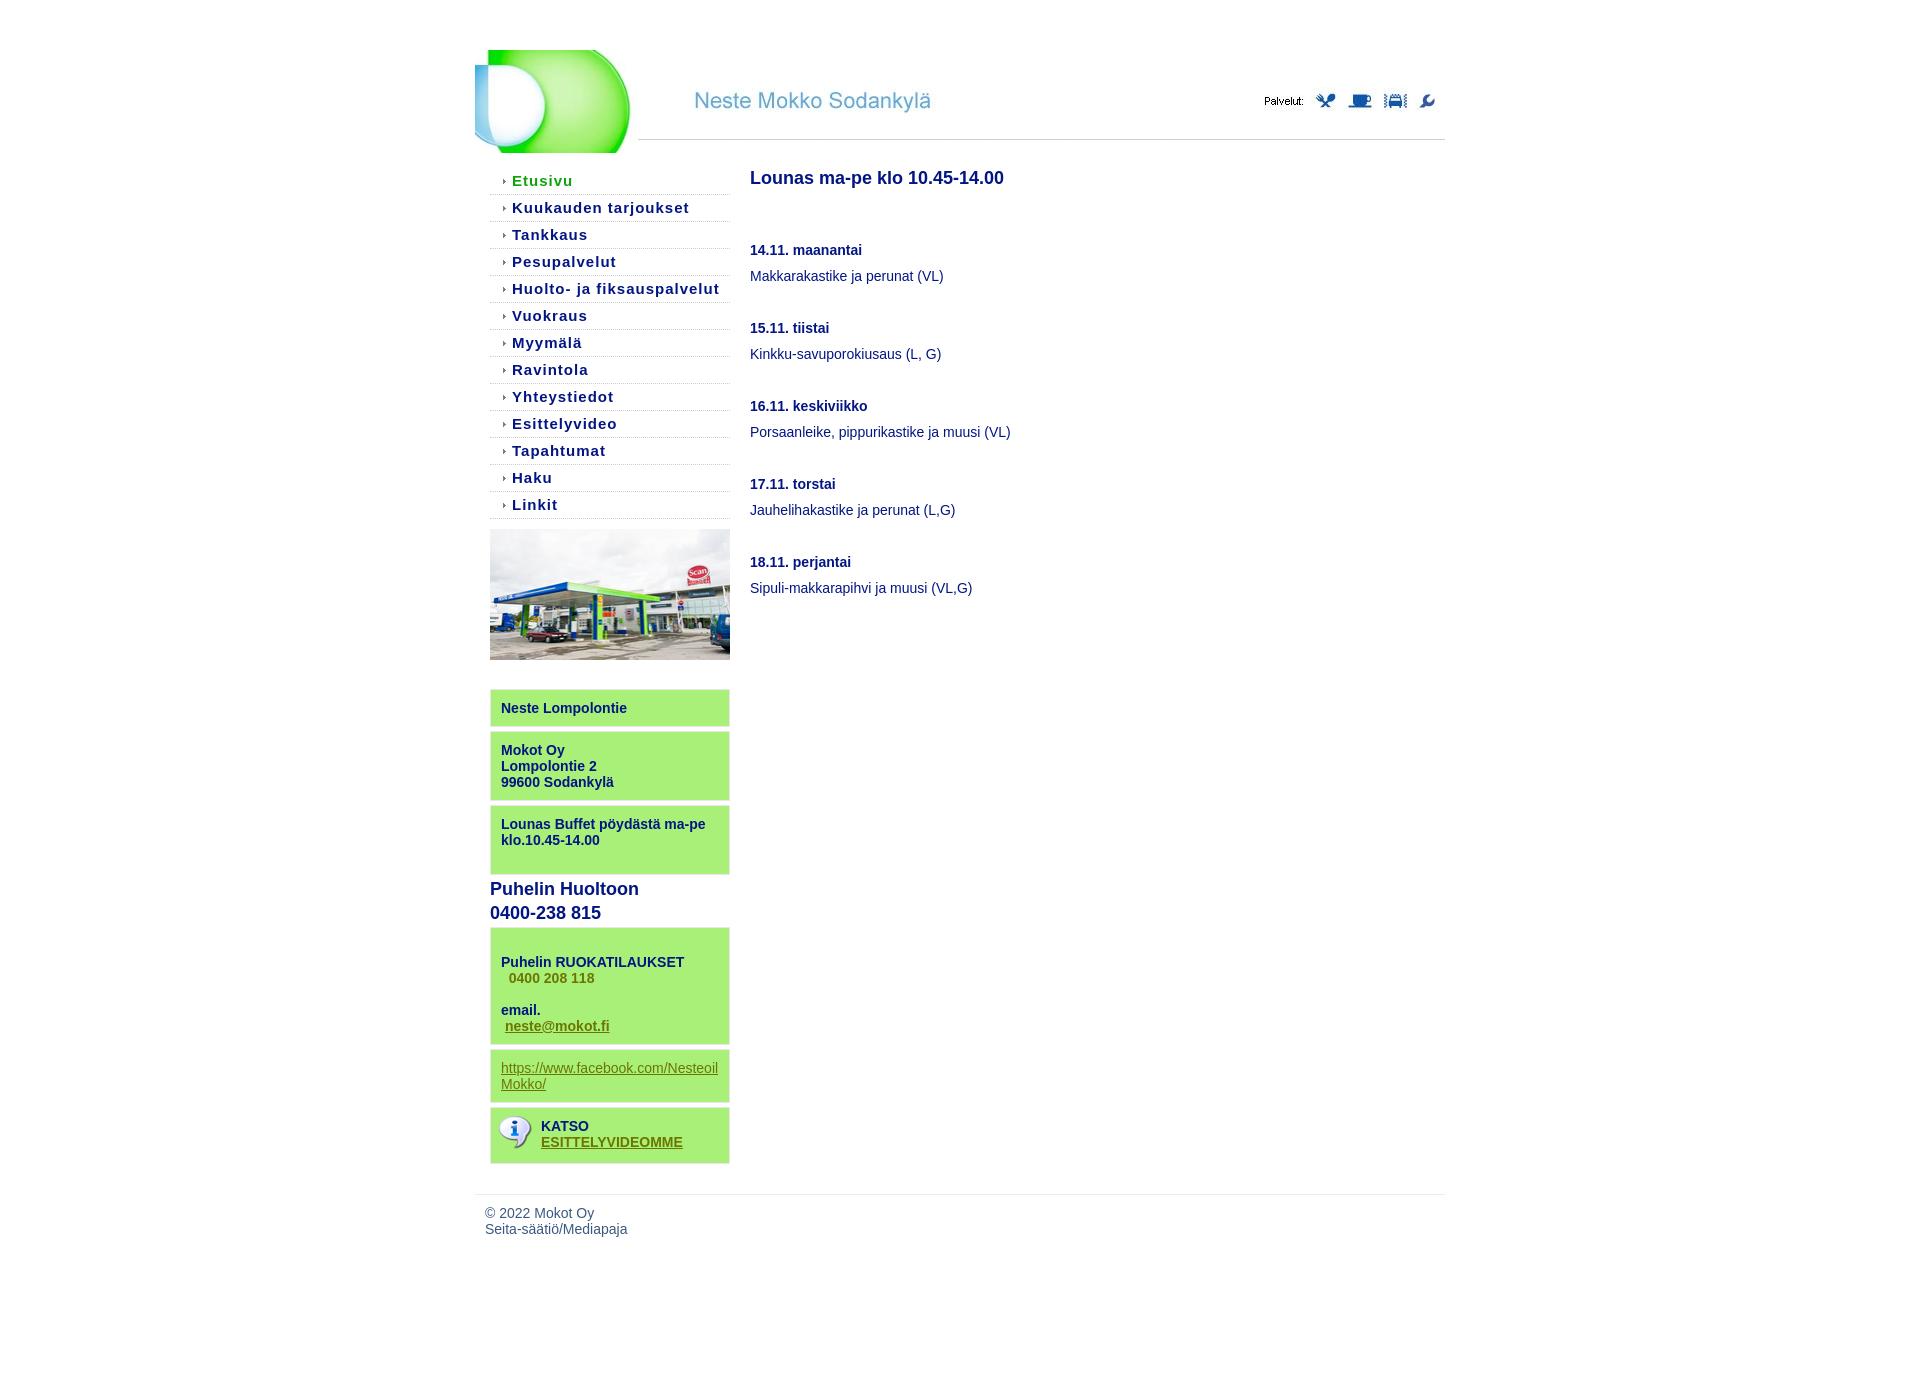 Screenshot for nestemokko.fi